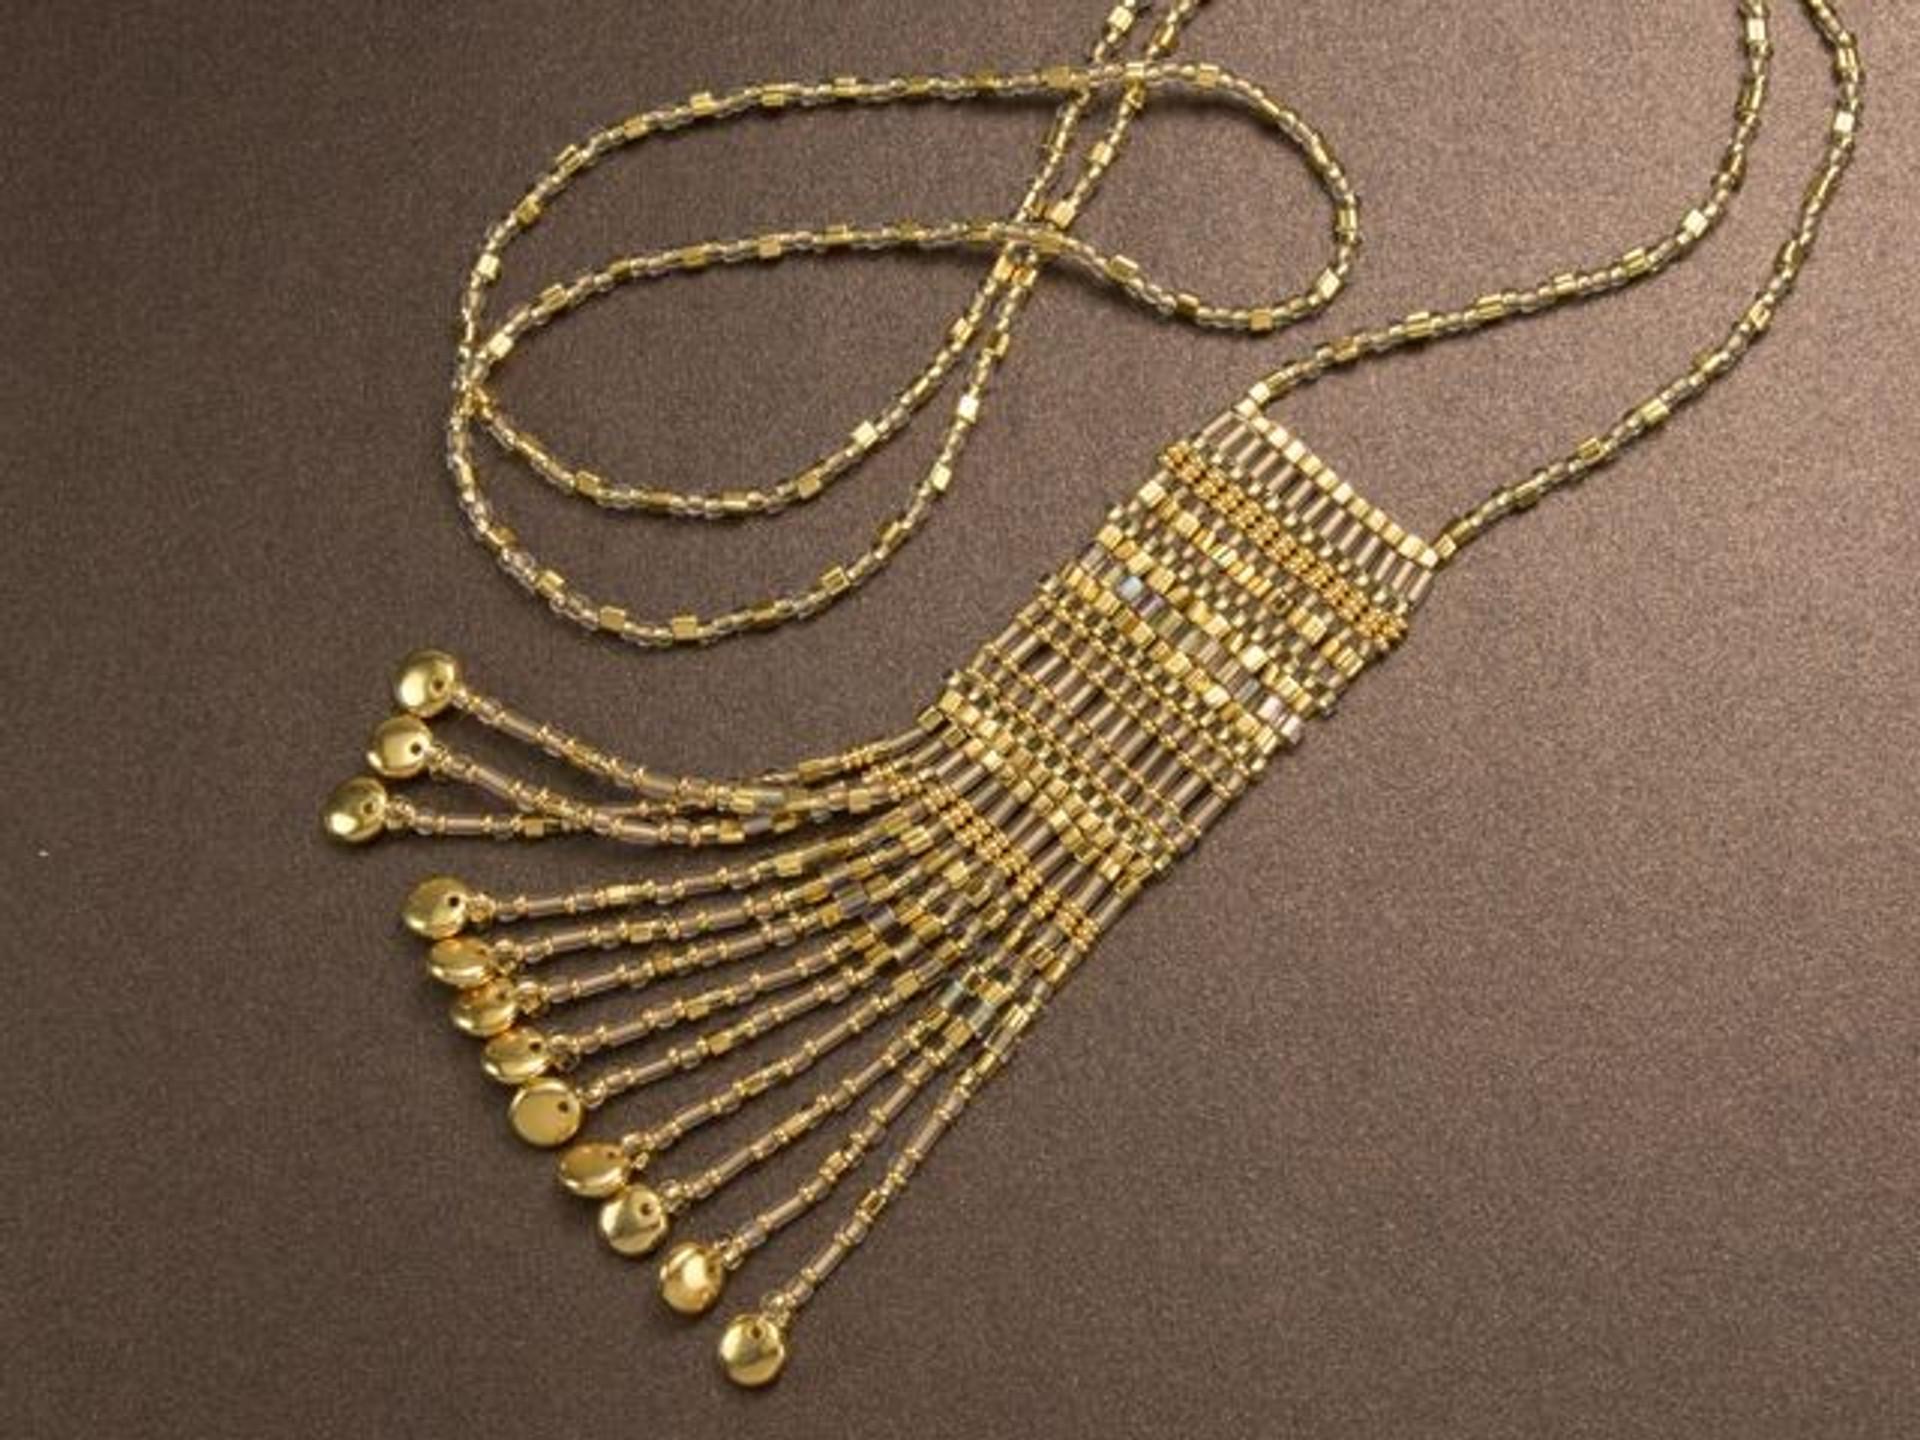 blue stitch necklace seed bead jewelry Toho glass bead necklace red beaded necklace Blue seed bead necklace blue beaded necklace